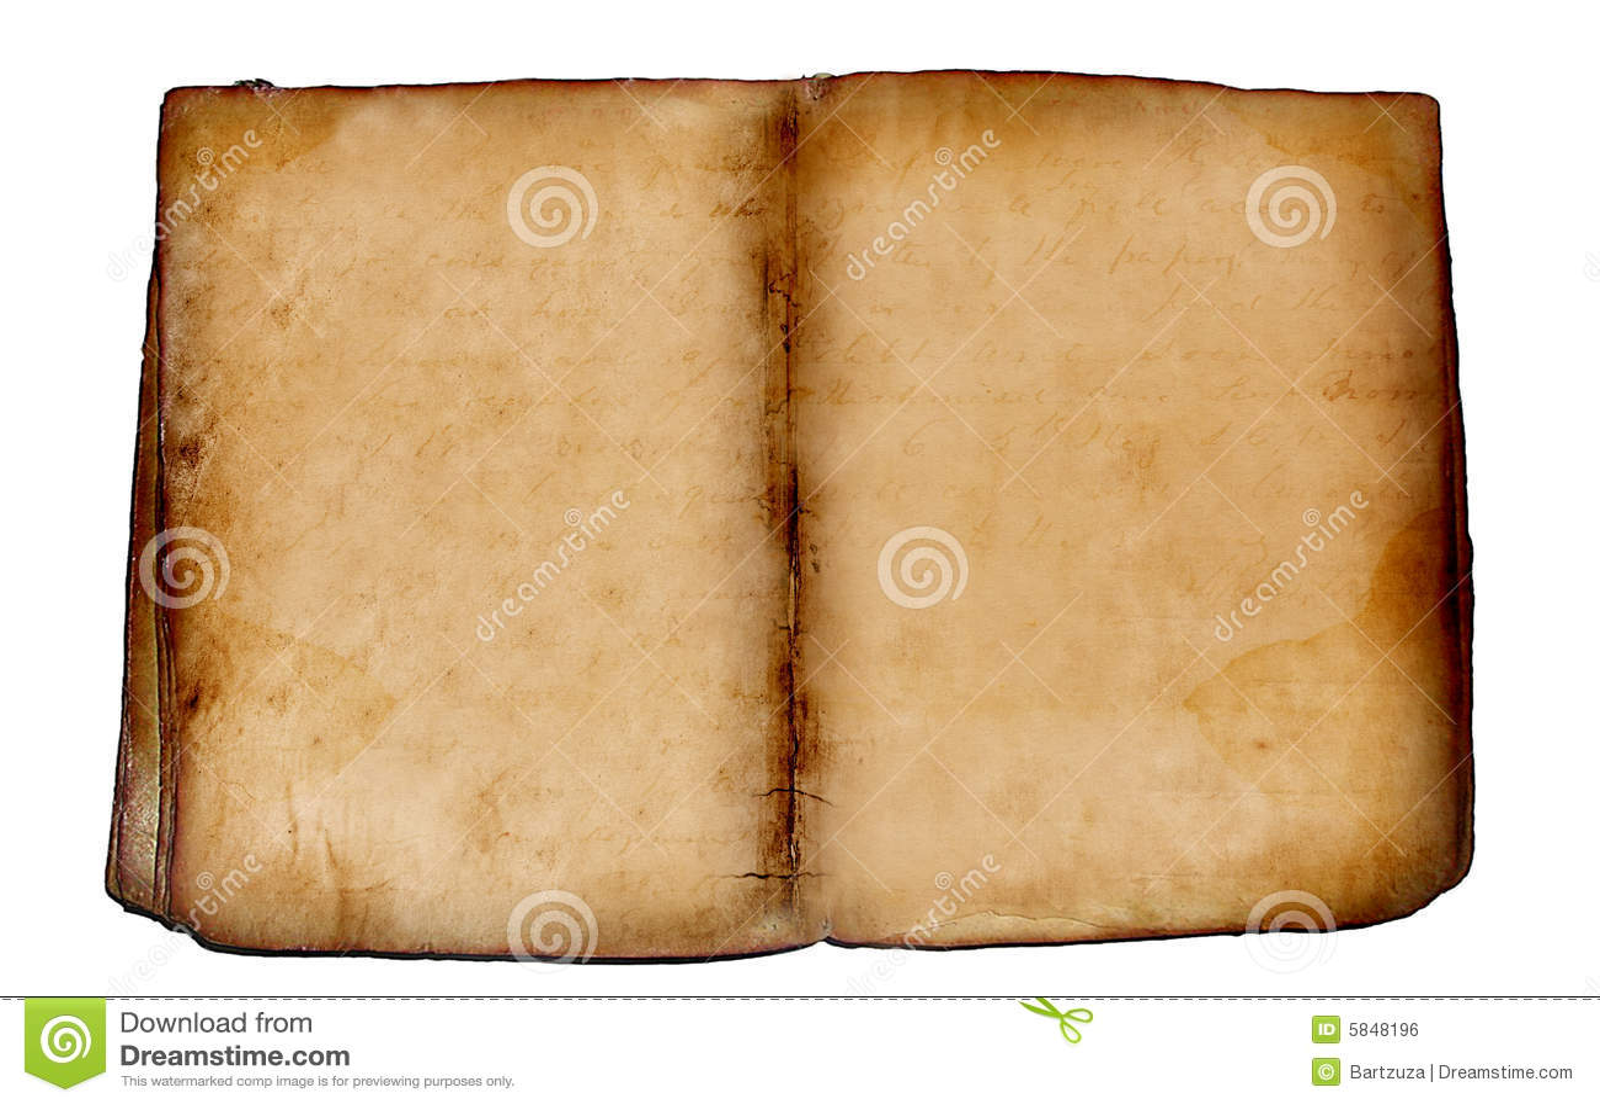 Altes Leeres Buch Lizenzfreies Stockbild - Bild: 5848196